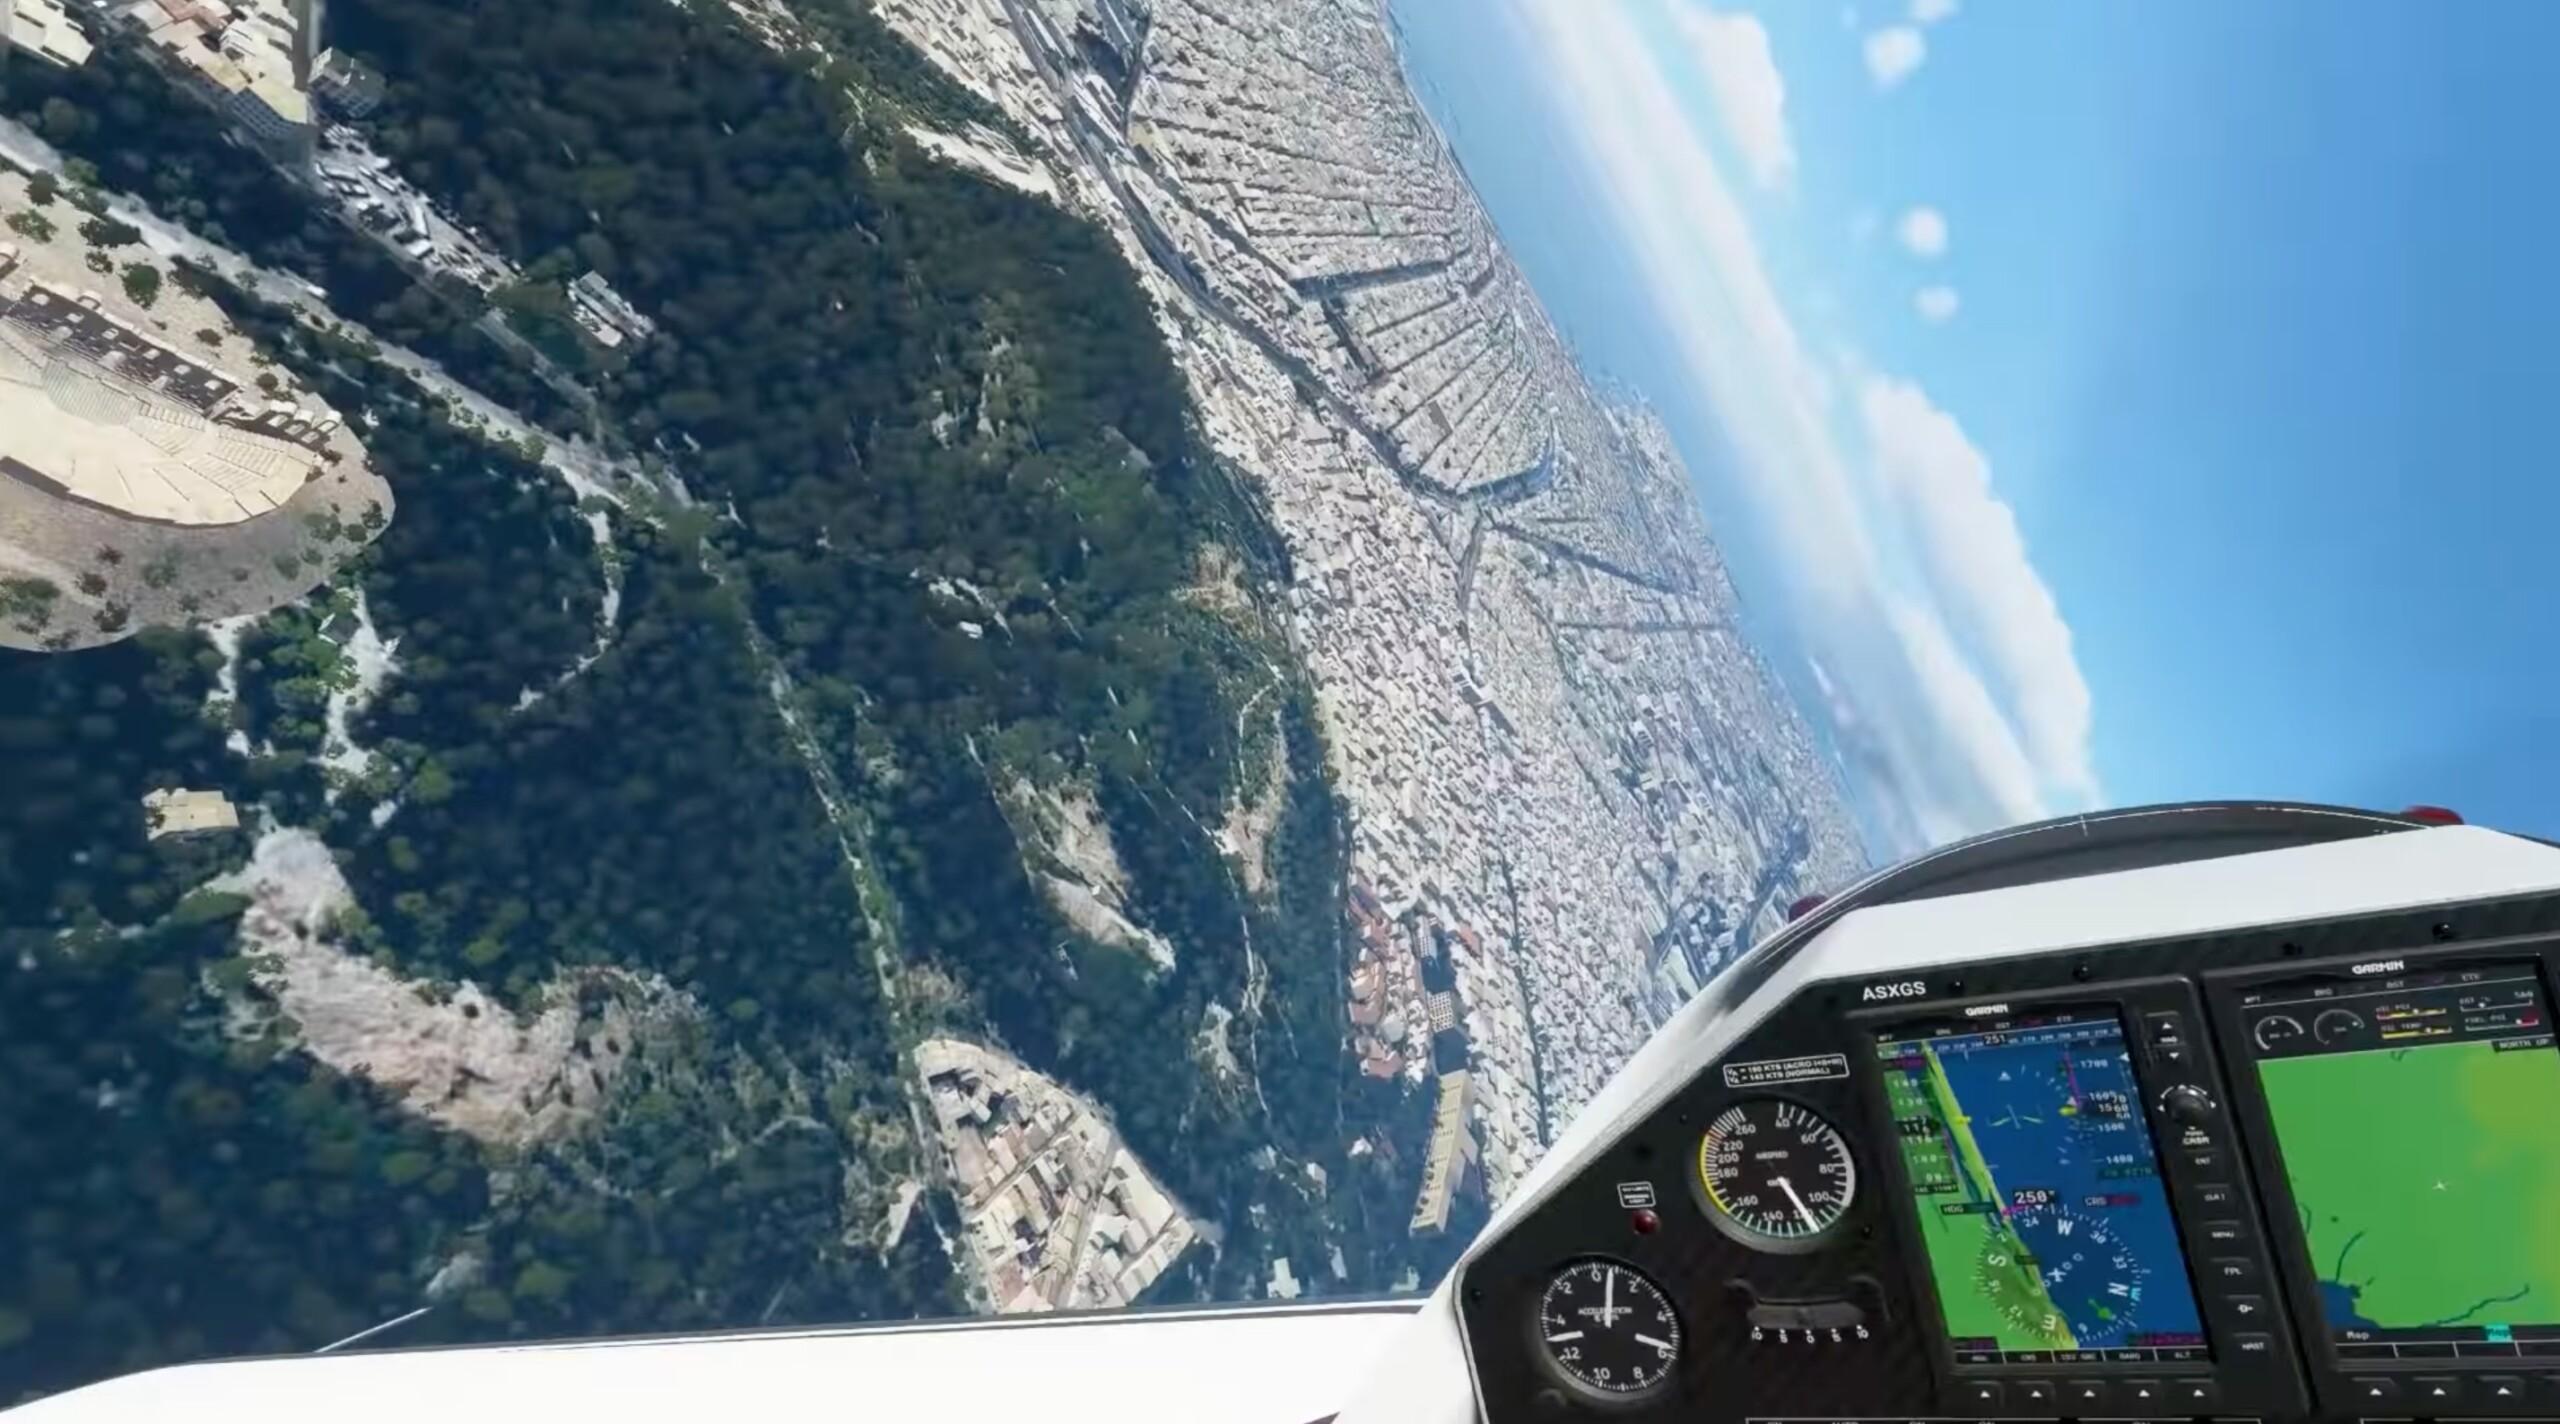 Microsoft Flight Simulator joue maintenant les filles de l'air en VR